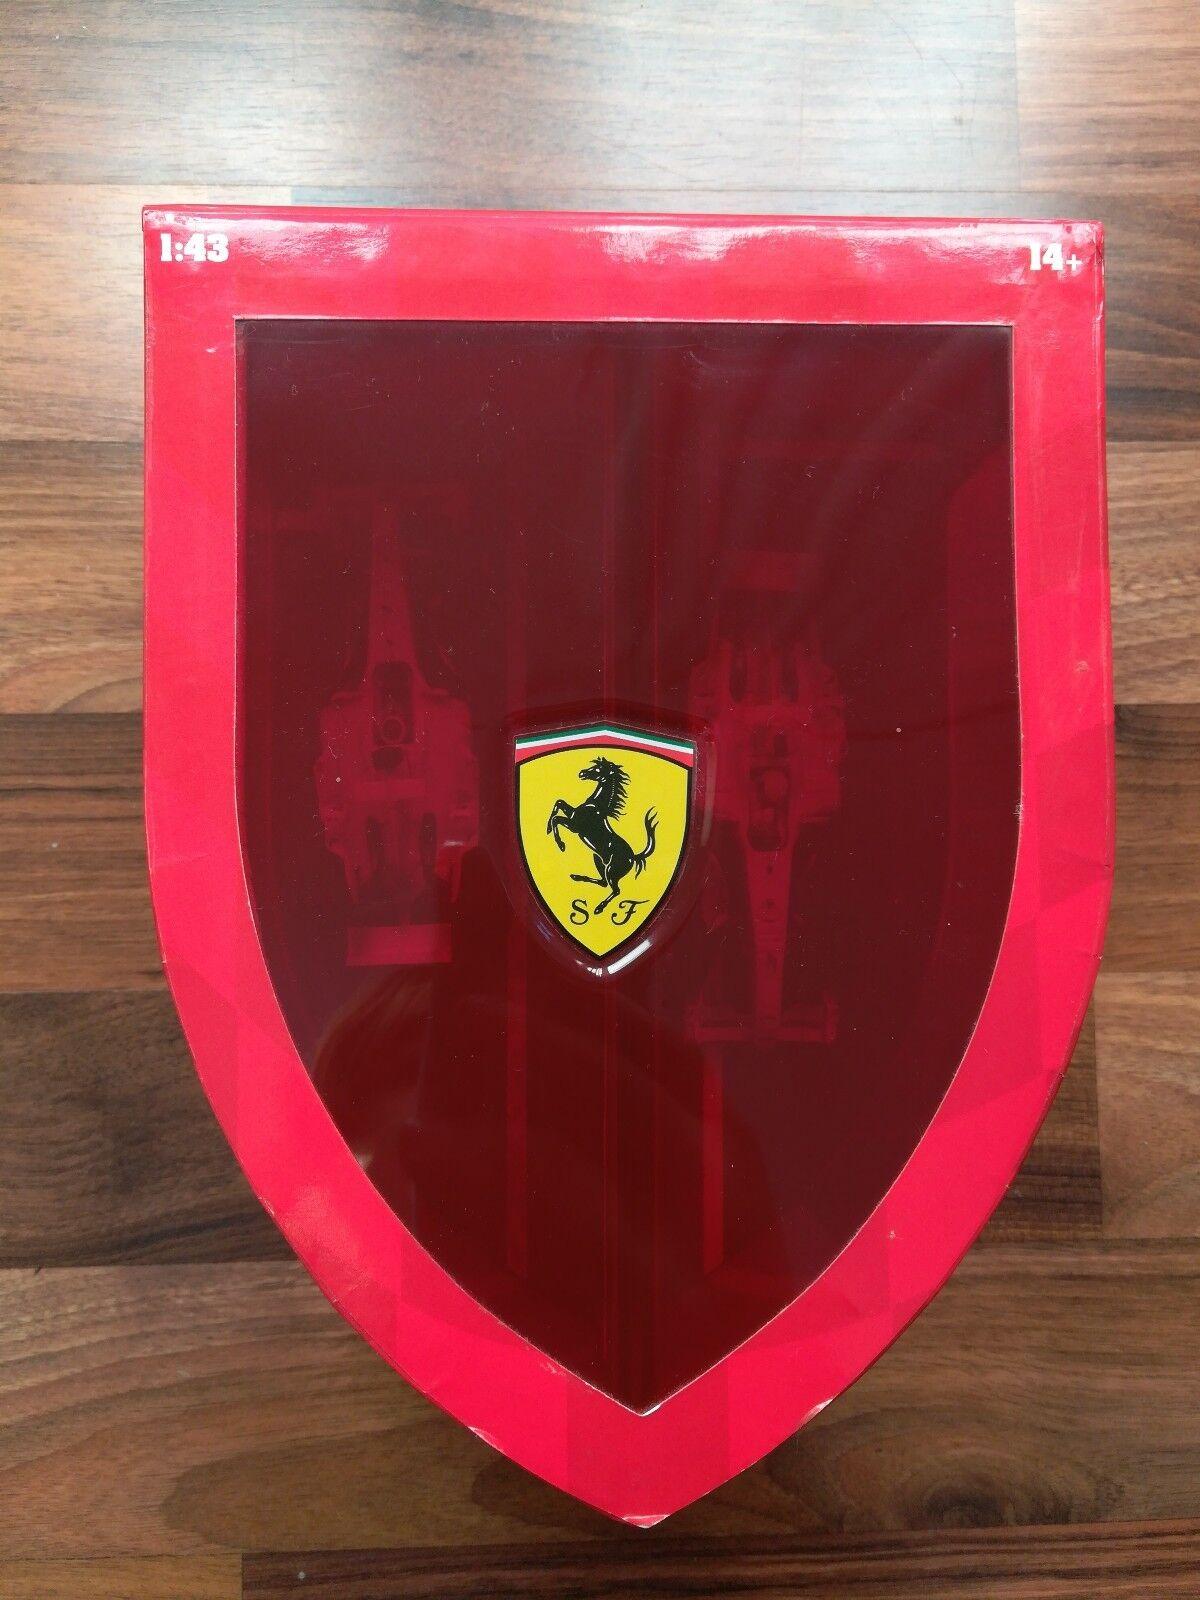 Hot Wheels - Mattel Ferrari Hungaroring 15.08.04 15.08.04 15.08.04 - World Champion - Neu - OVP 98ee58